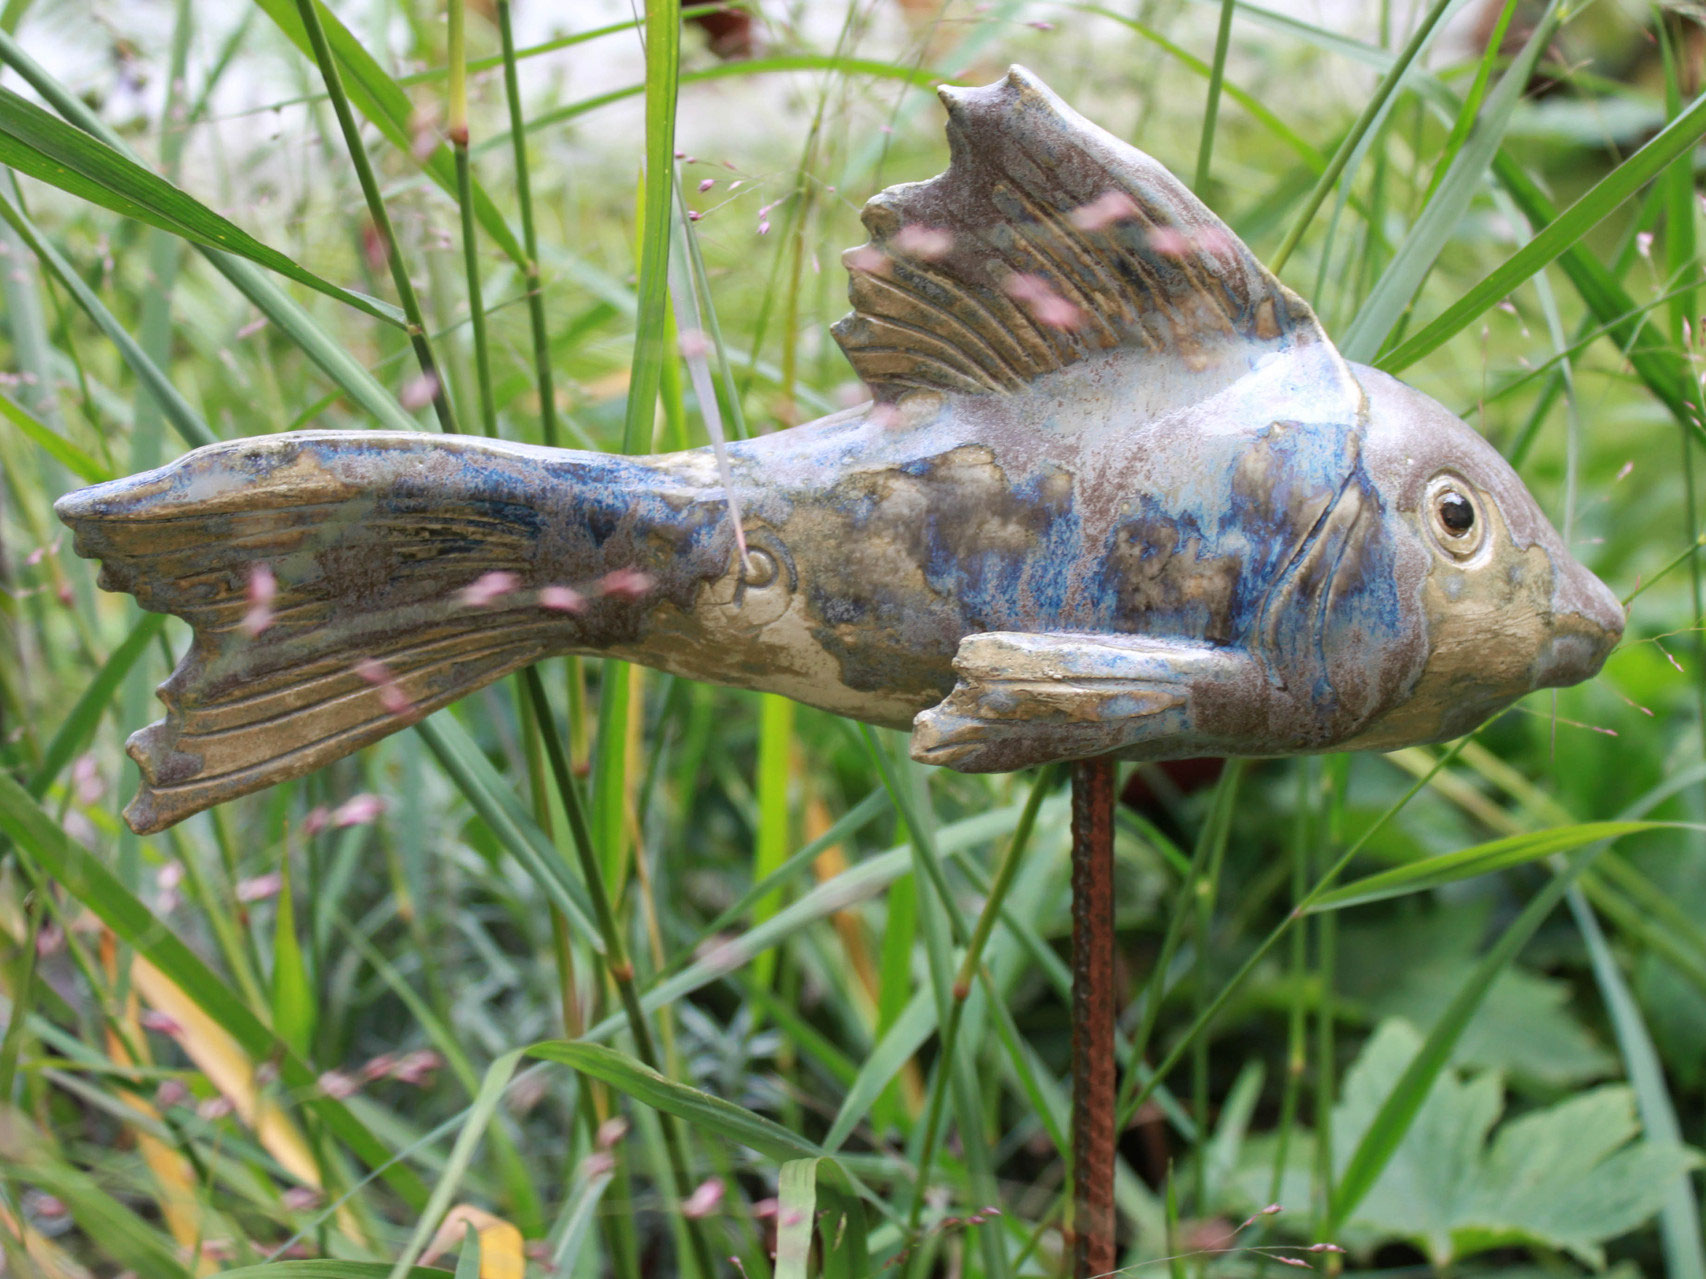 Keramik fische und gartenkunst keramik atelier for Garten fische